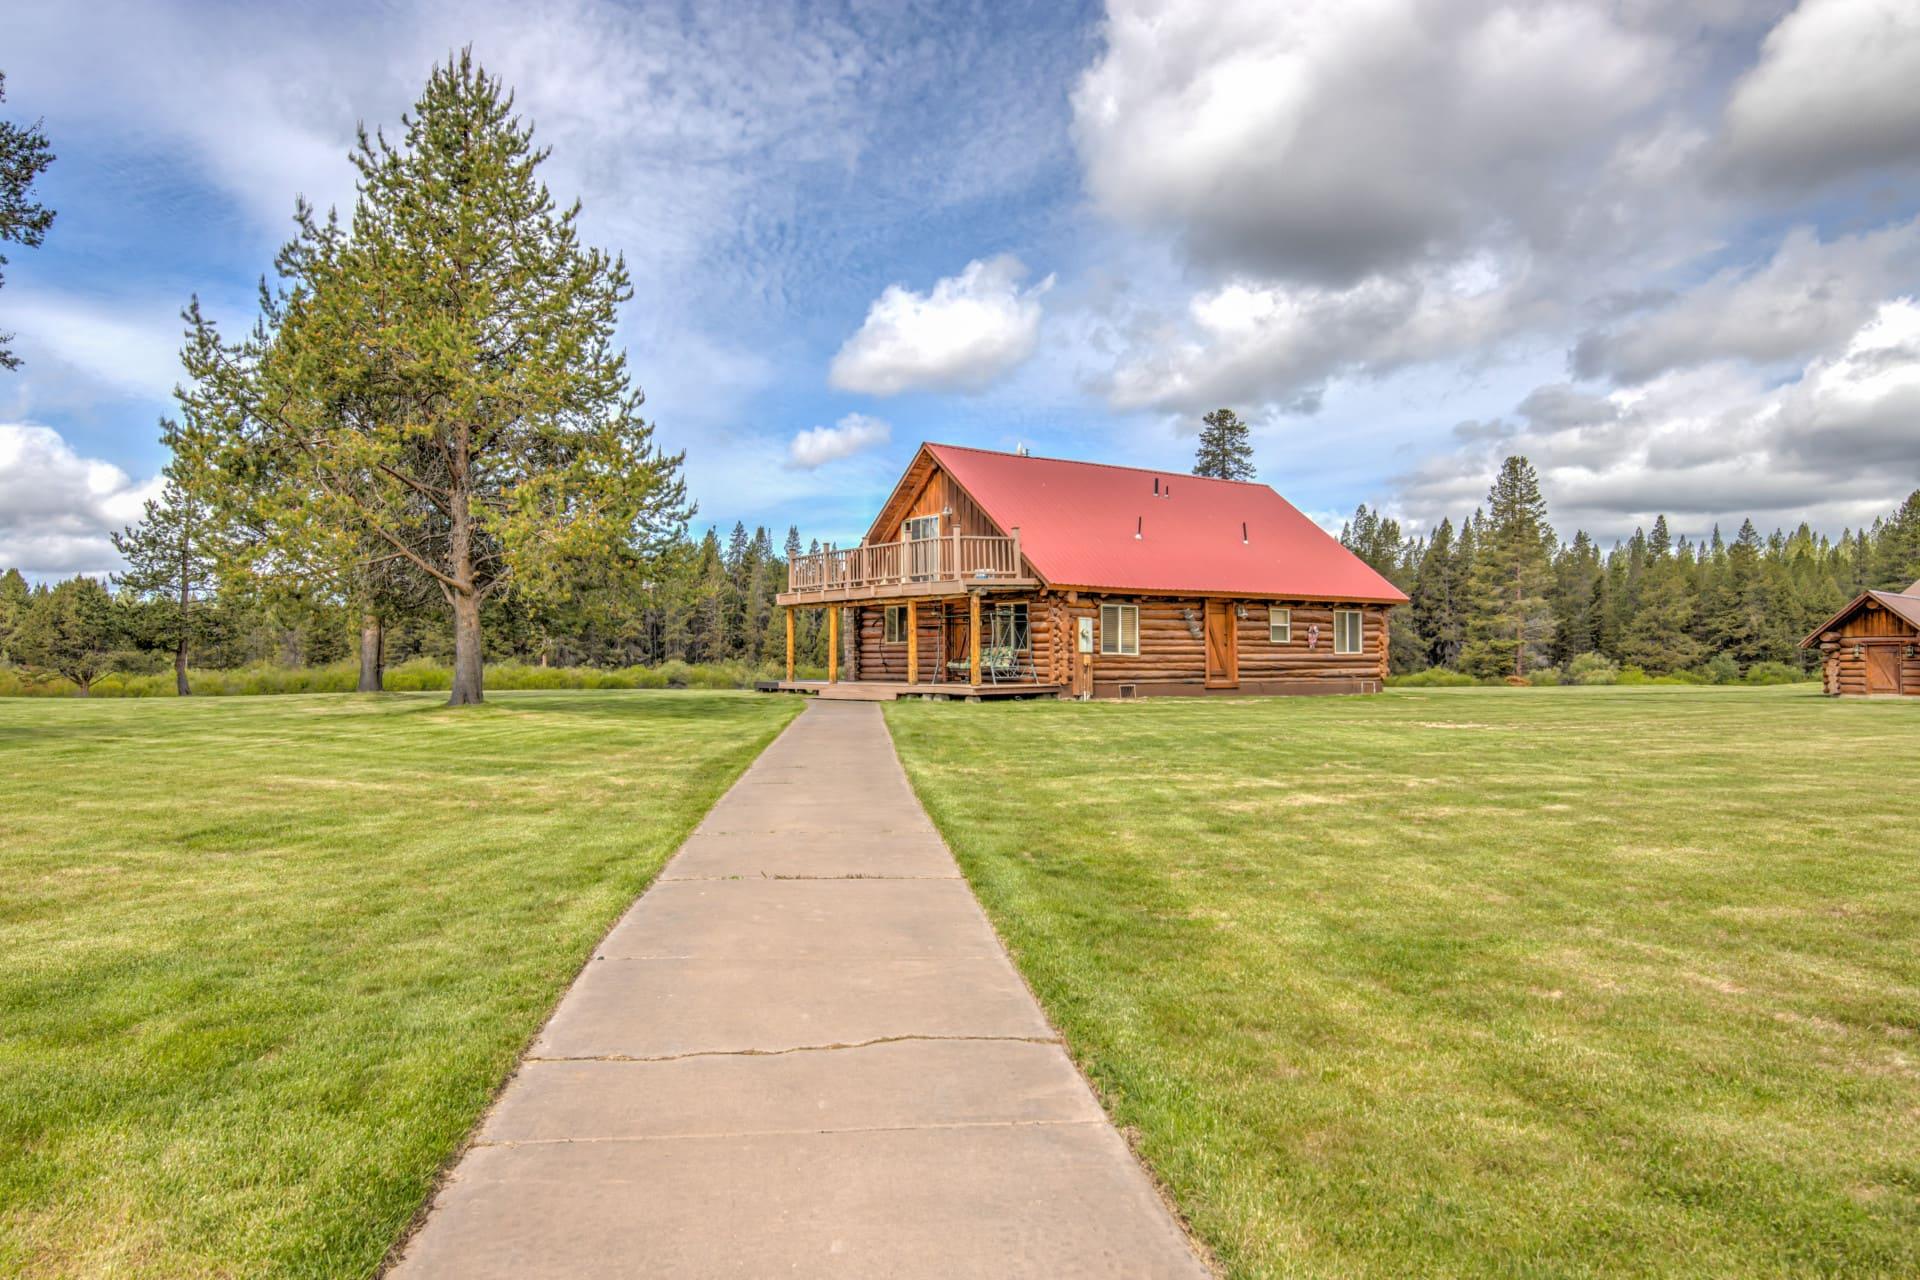 log house for sale oregon d bar x ranch